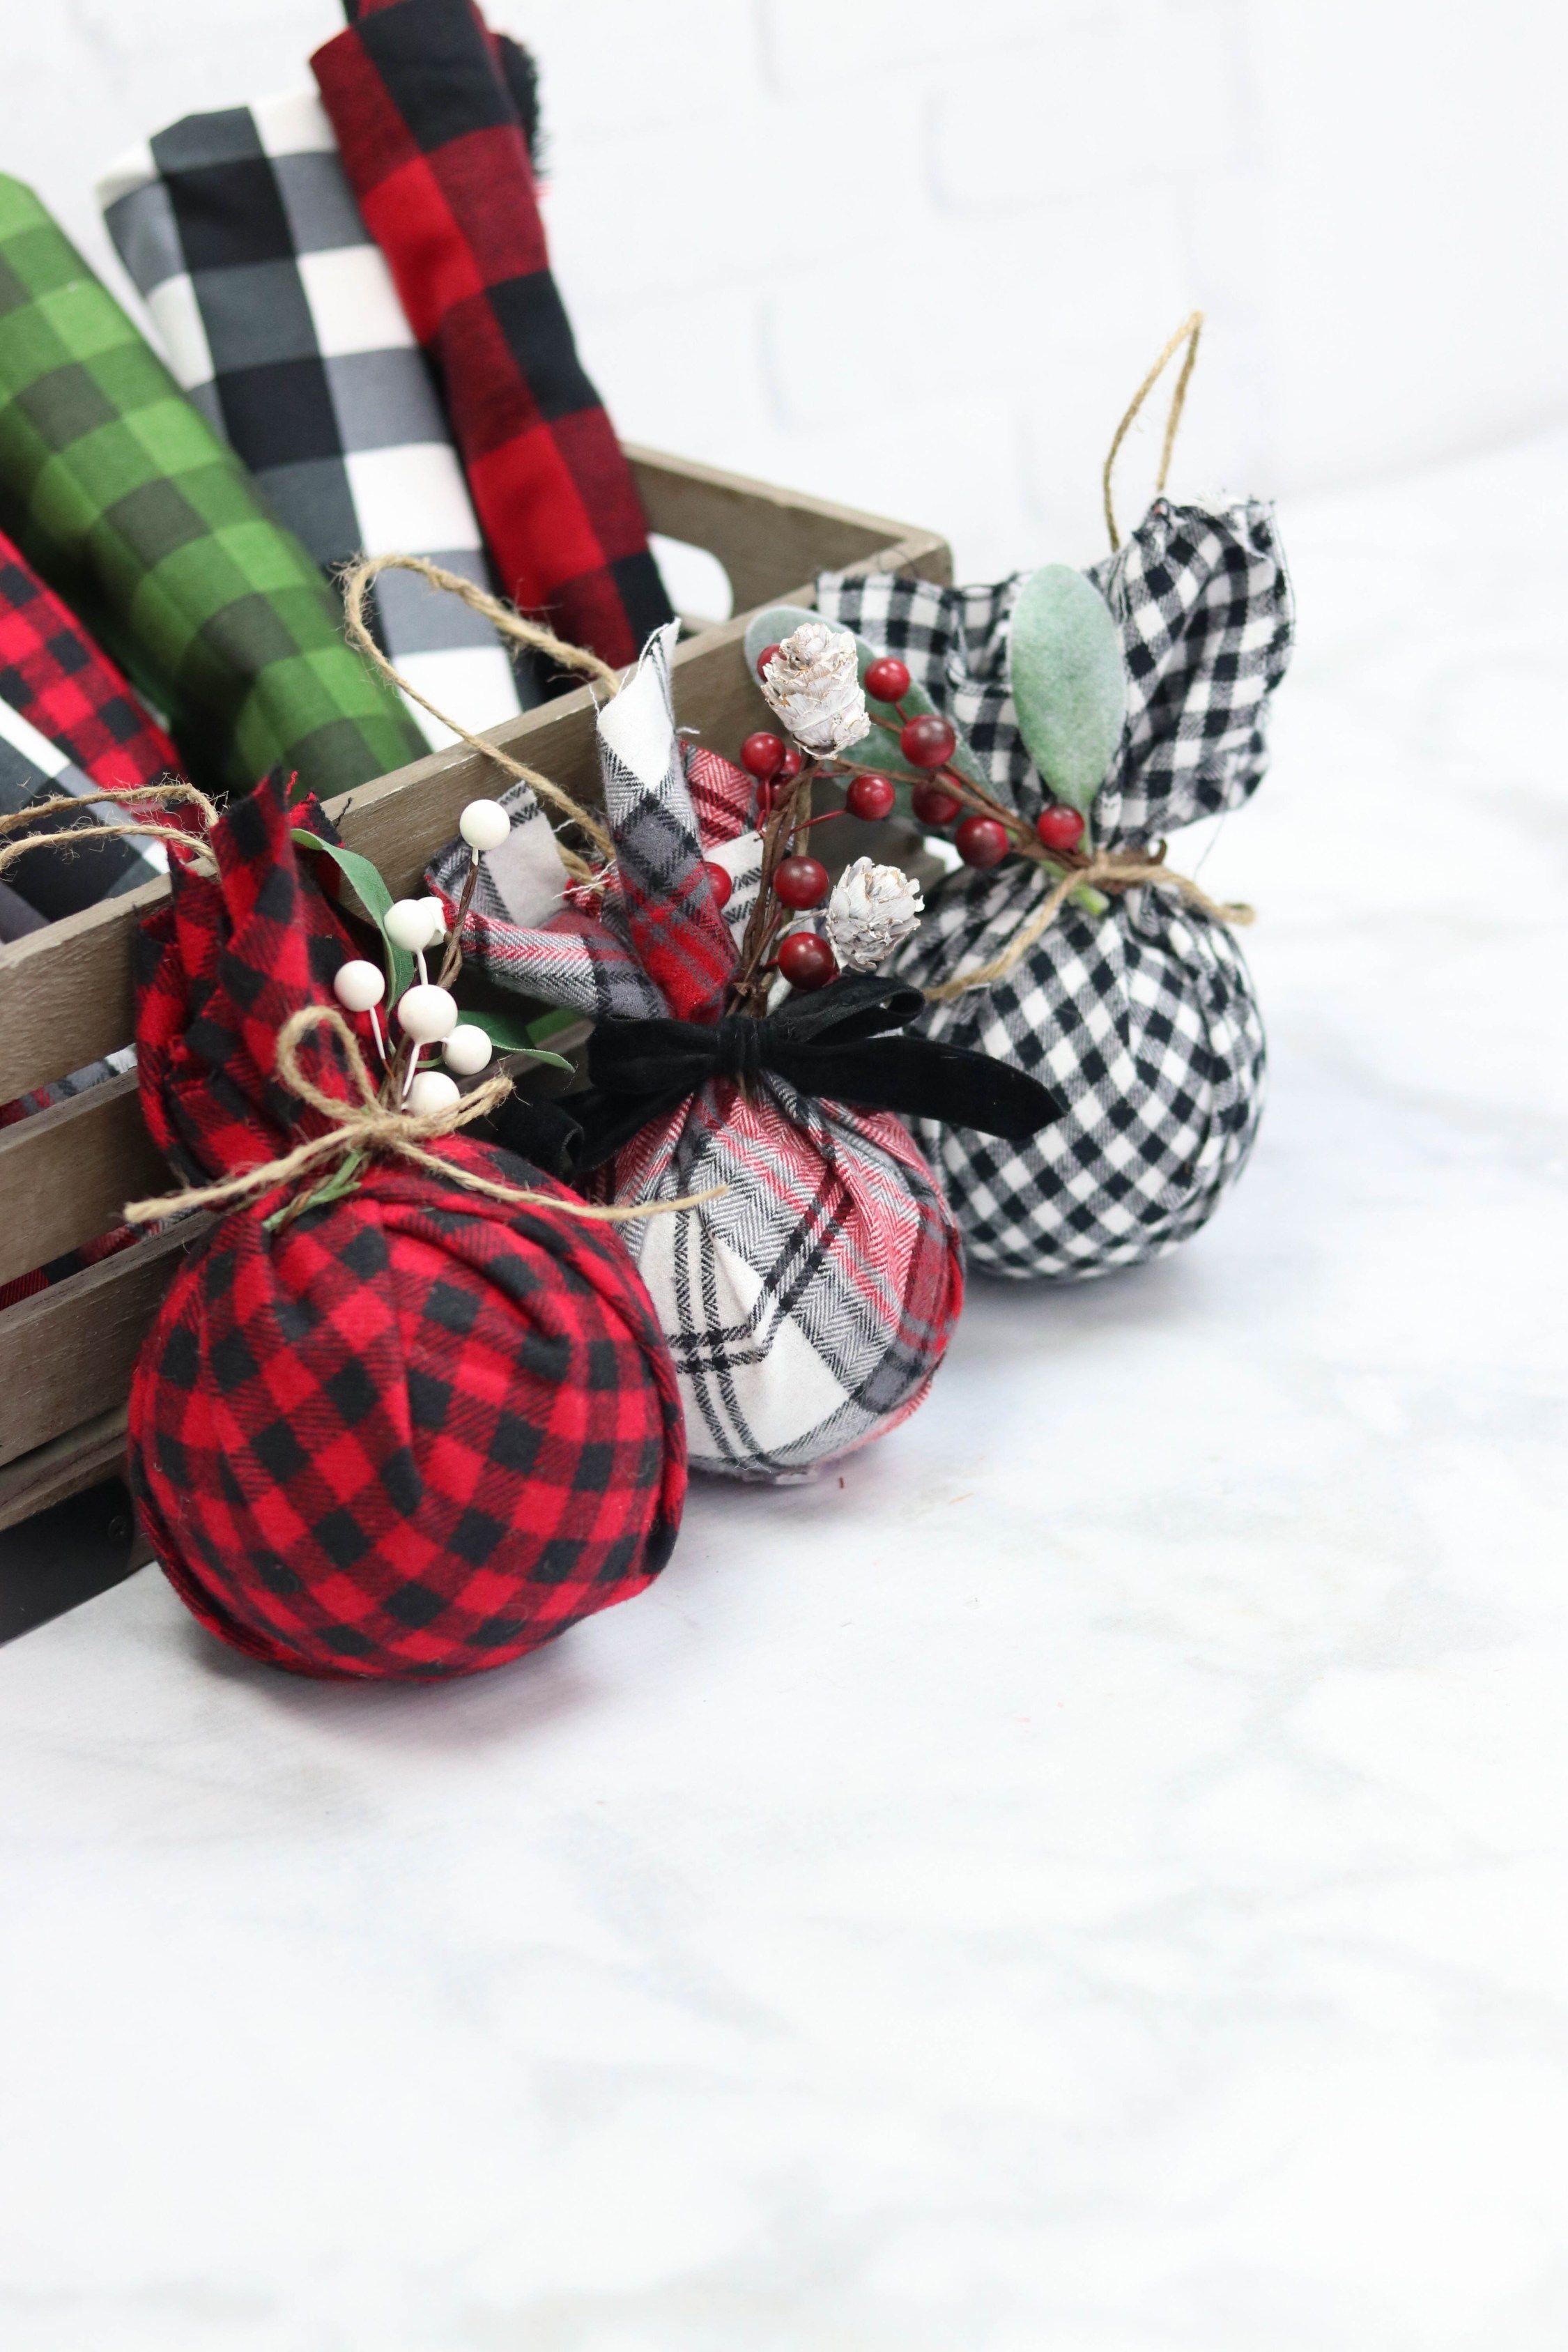 Diy Christmas Ornaments Joann Diy Christmas Ornaments Christmas Crafts Diy Christmas Ornaments